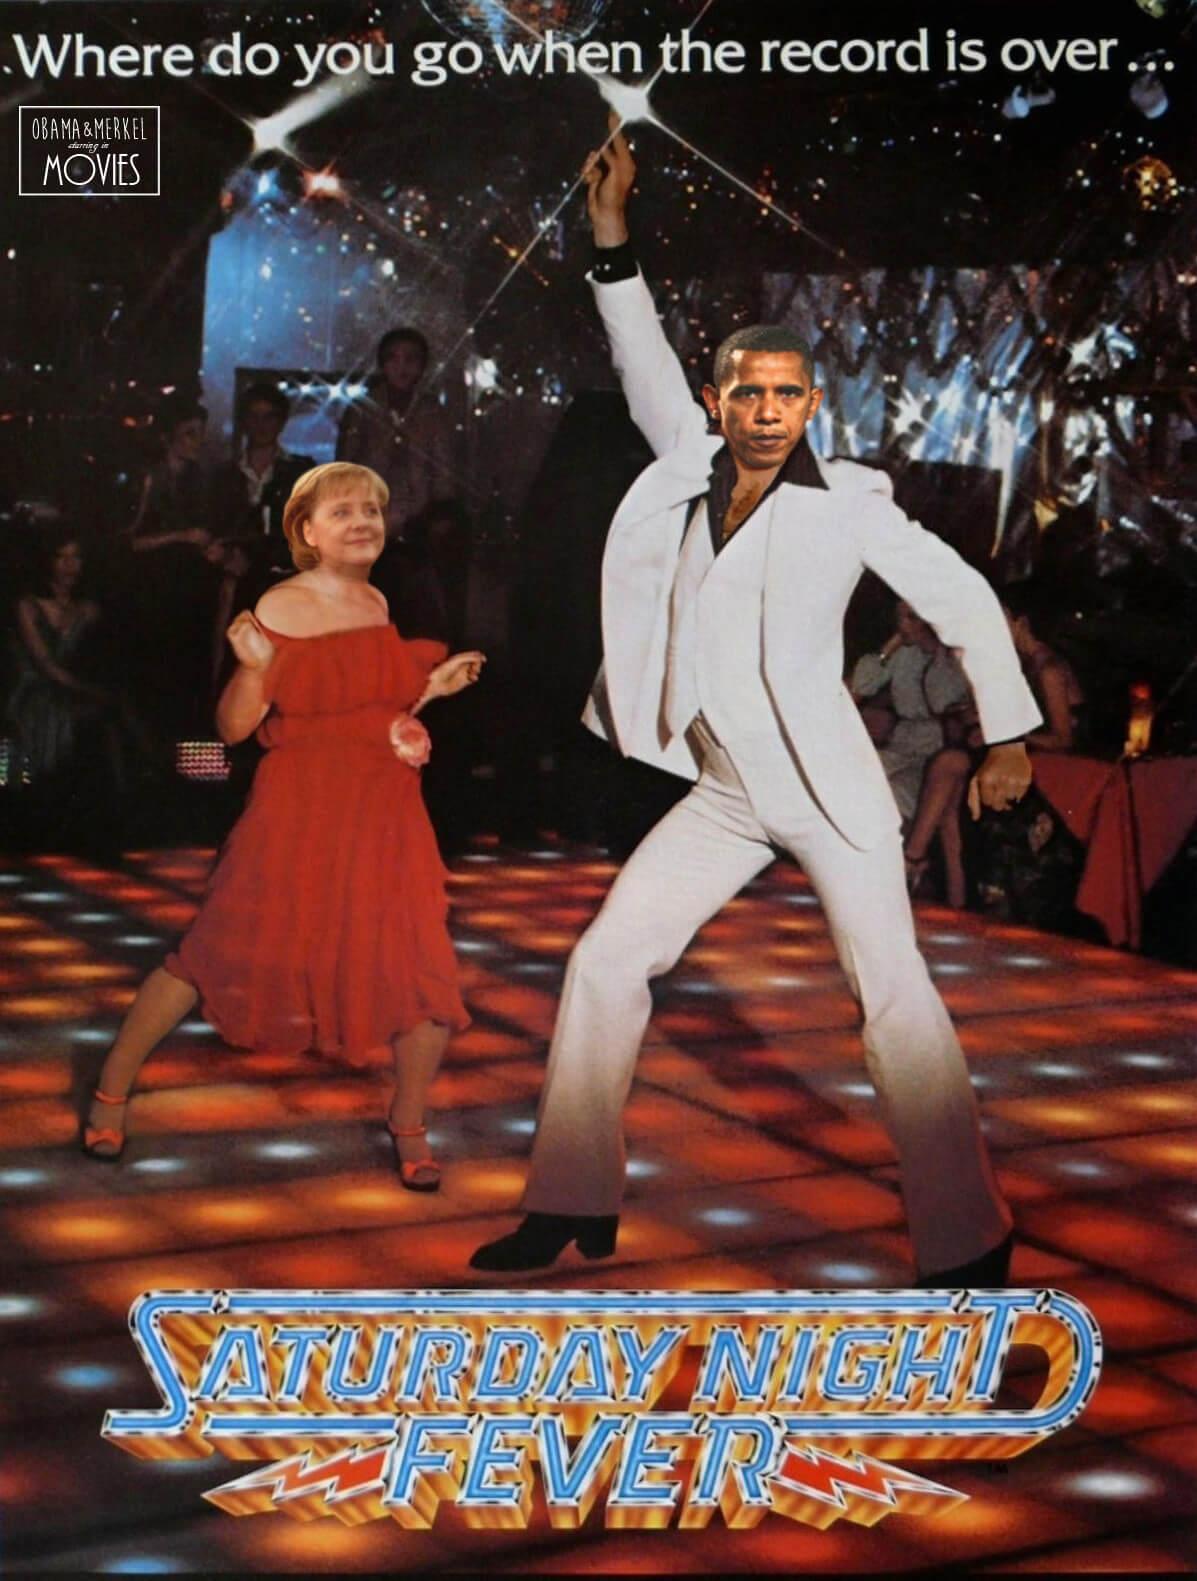 obama merkel putin famous movies 20